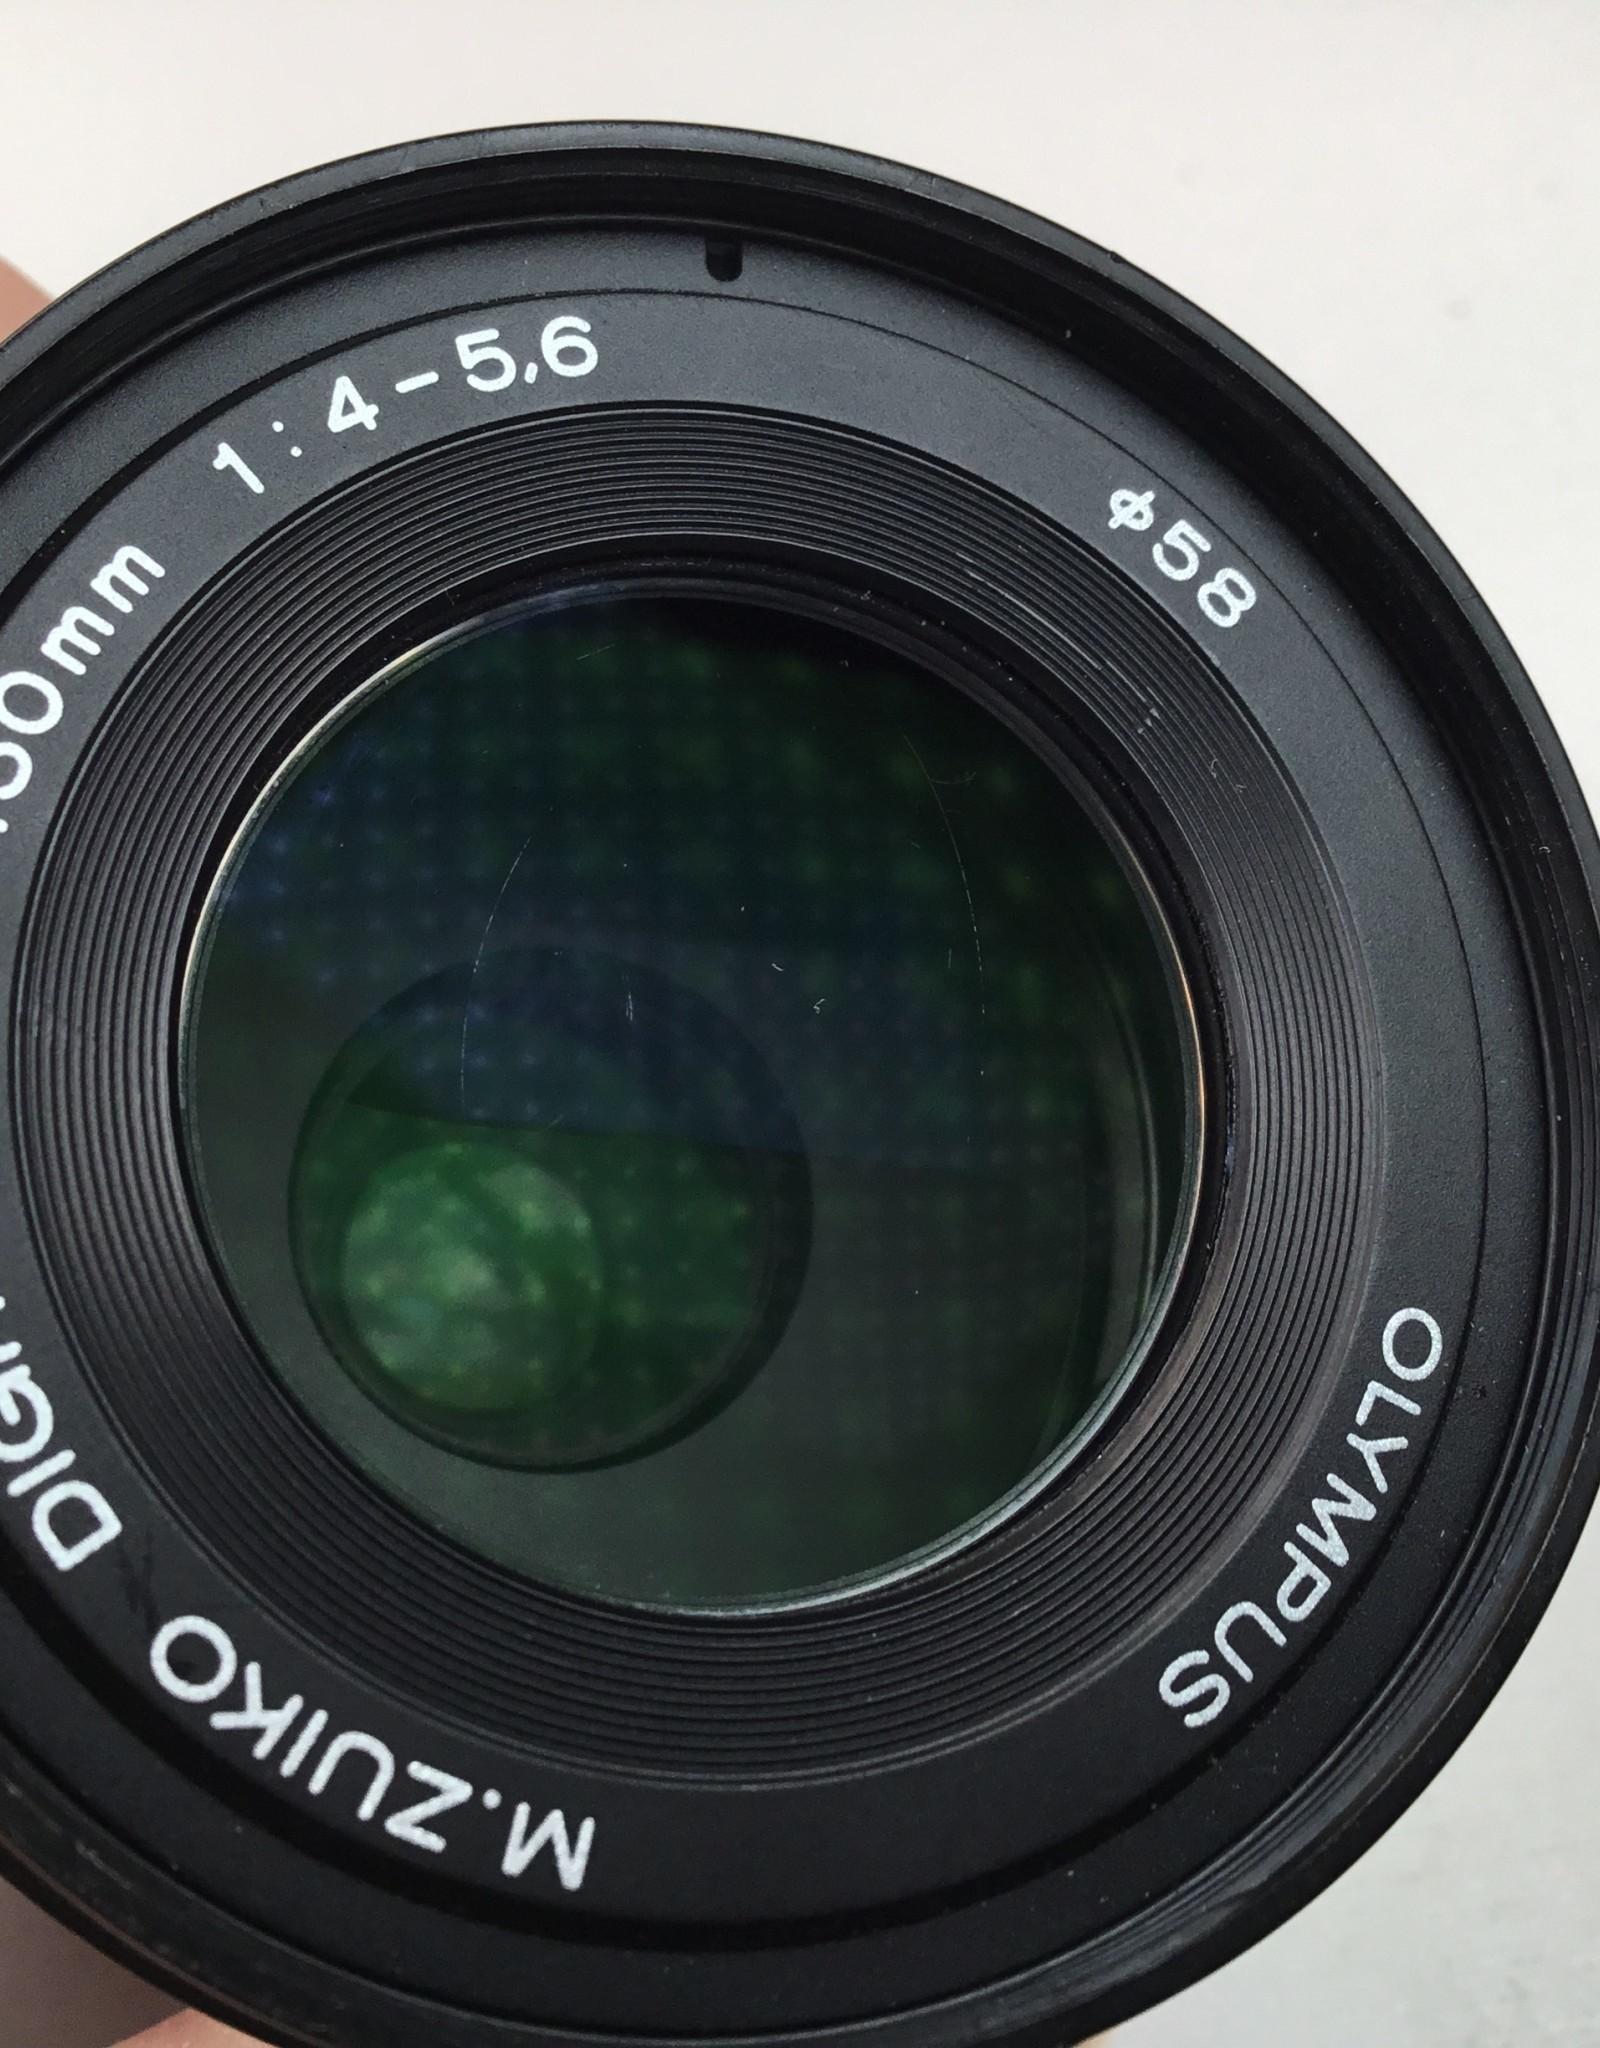 OLYMPUS Olympus 40-150mm f4-5.6 Lens Used EX